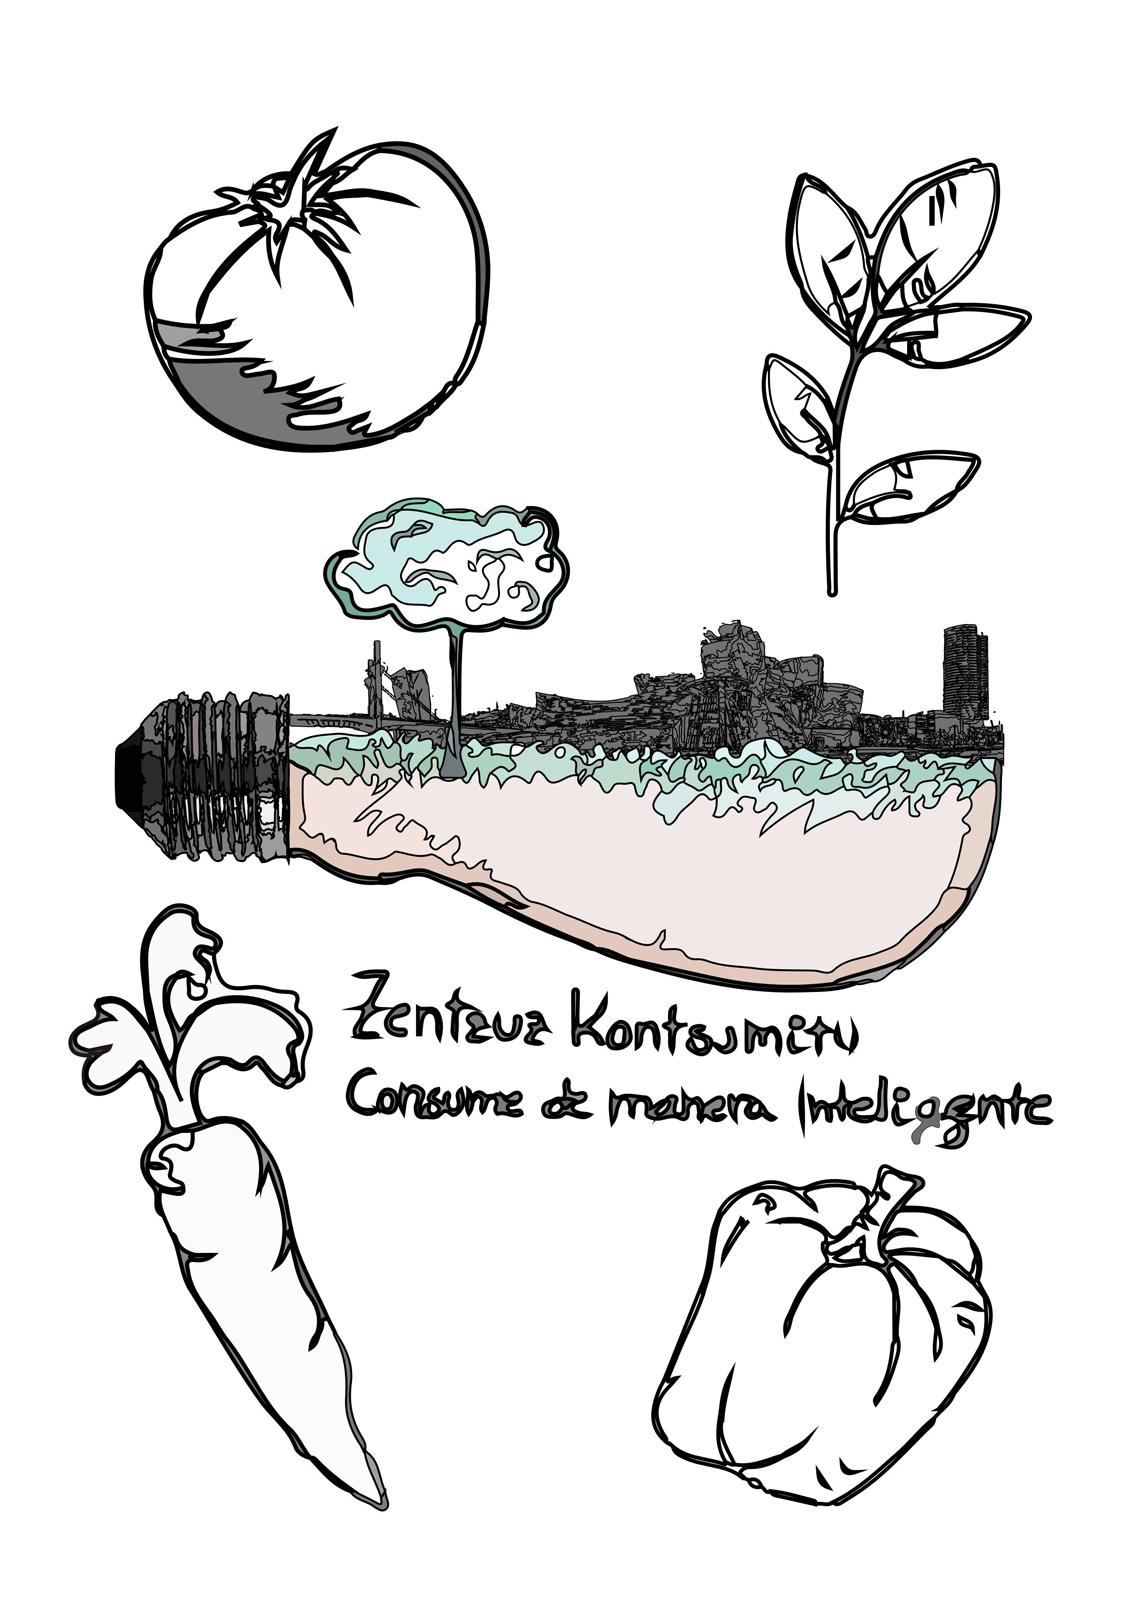 zentzuz kontsumitu consume de manera inteligente